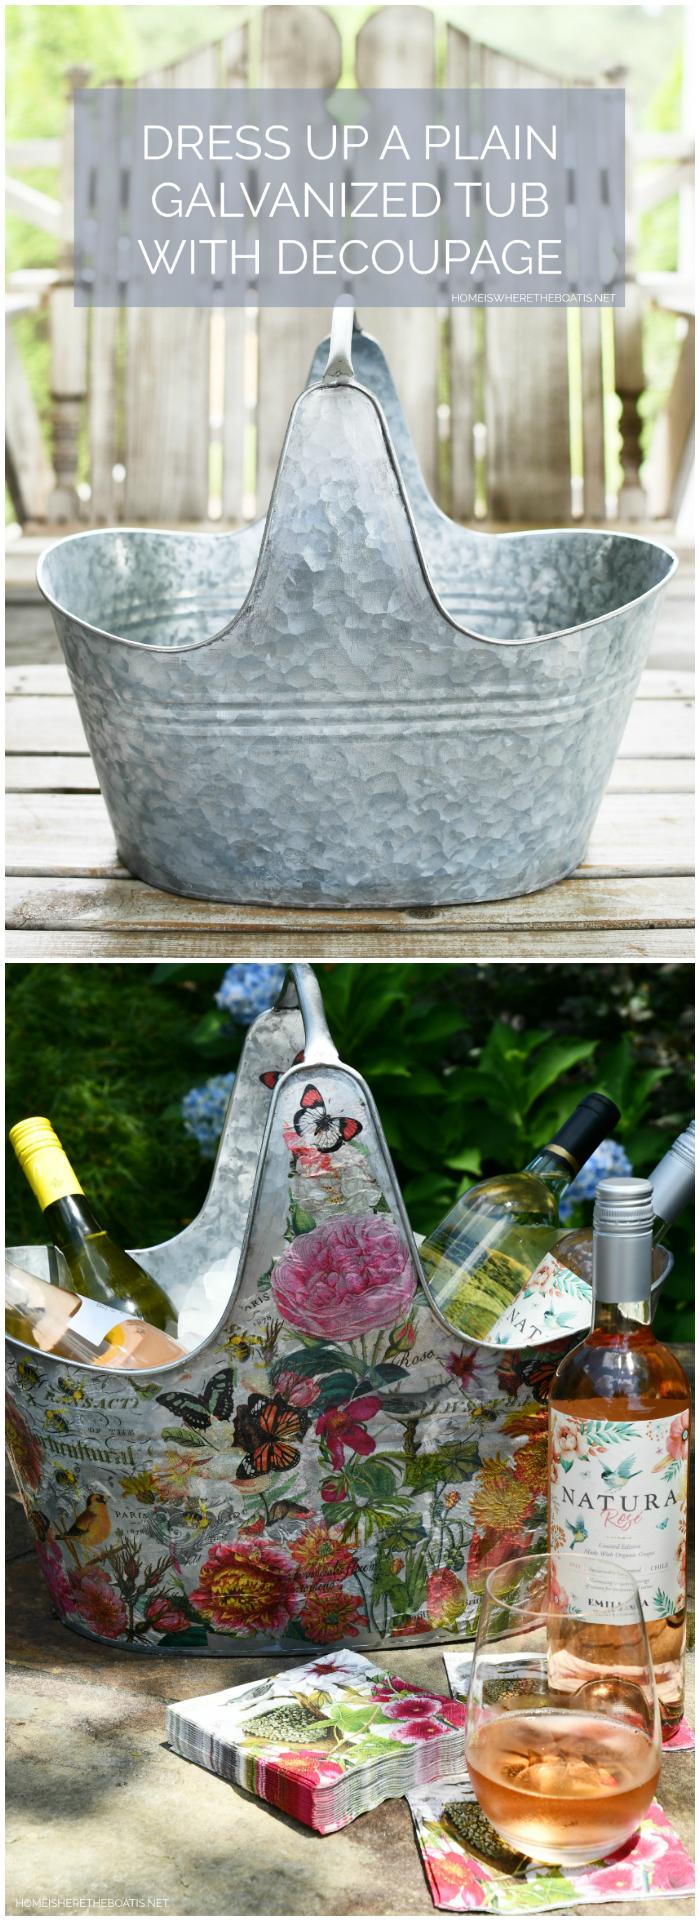 DIY Decoupage galvanized beverage tub | ©homeiswheretheboatis.net #DIY #craft